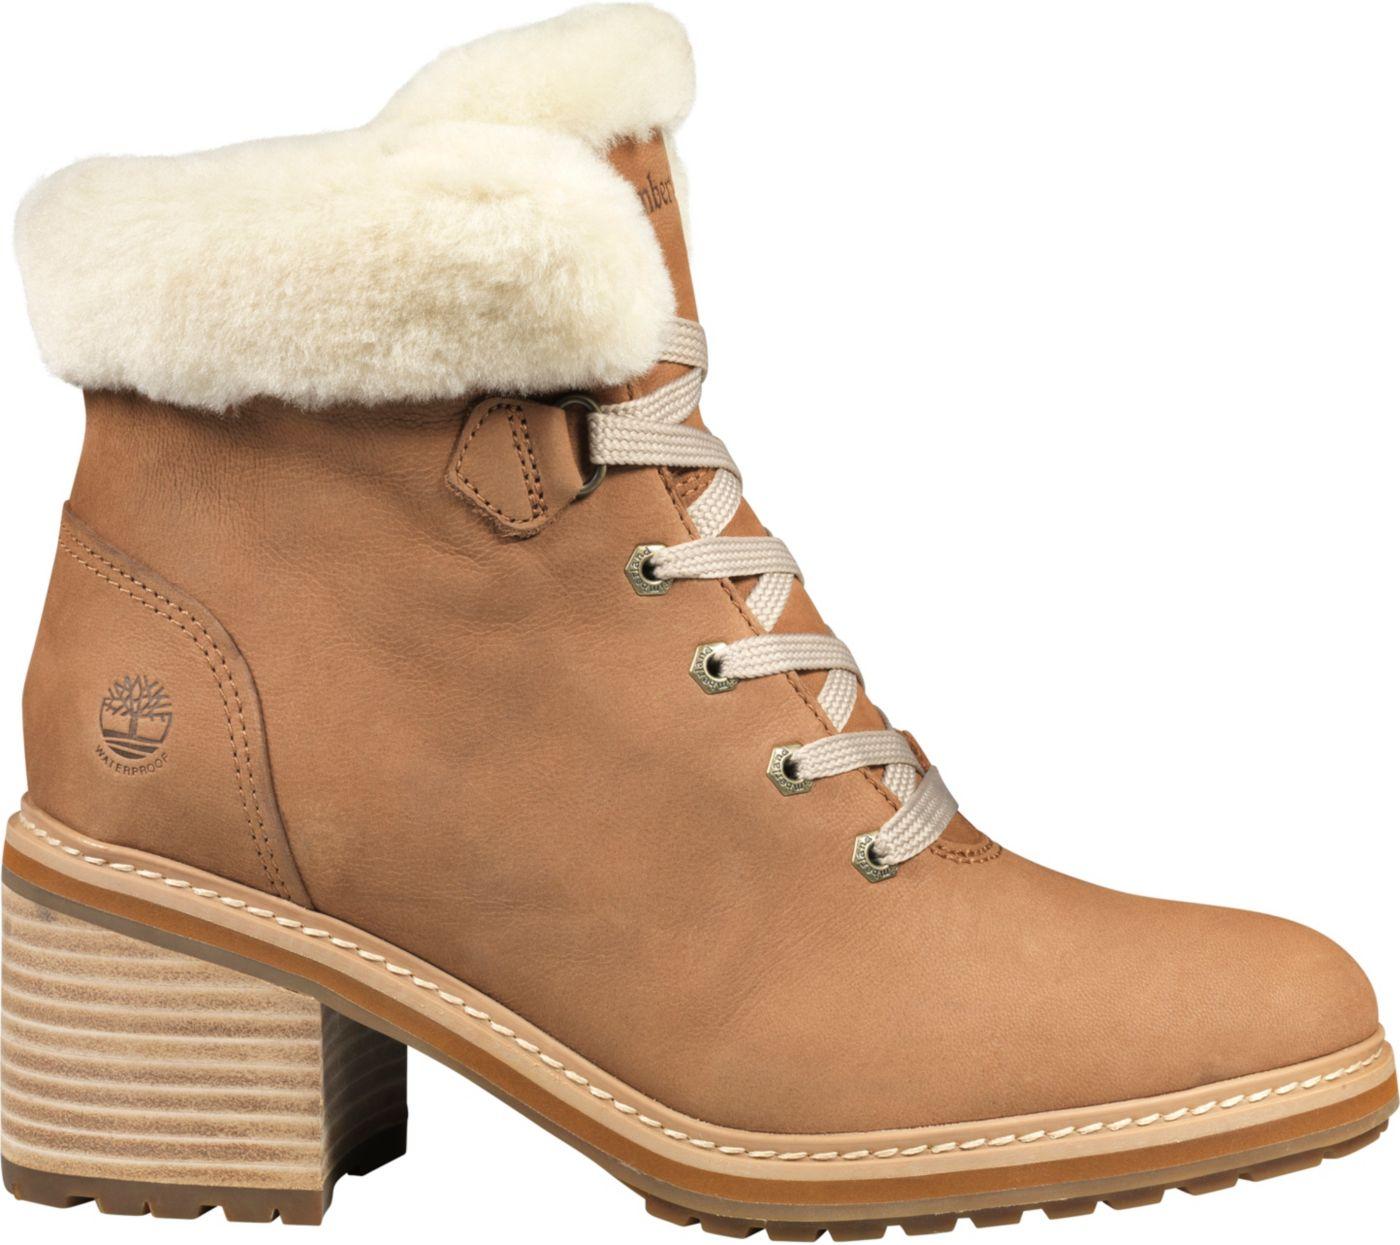 Timberland Women's Sienna Waterproof Casual Boots